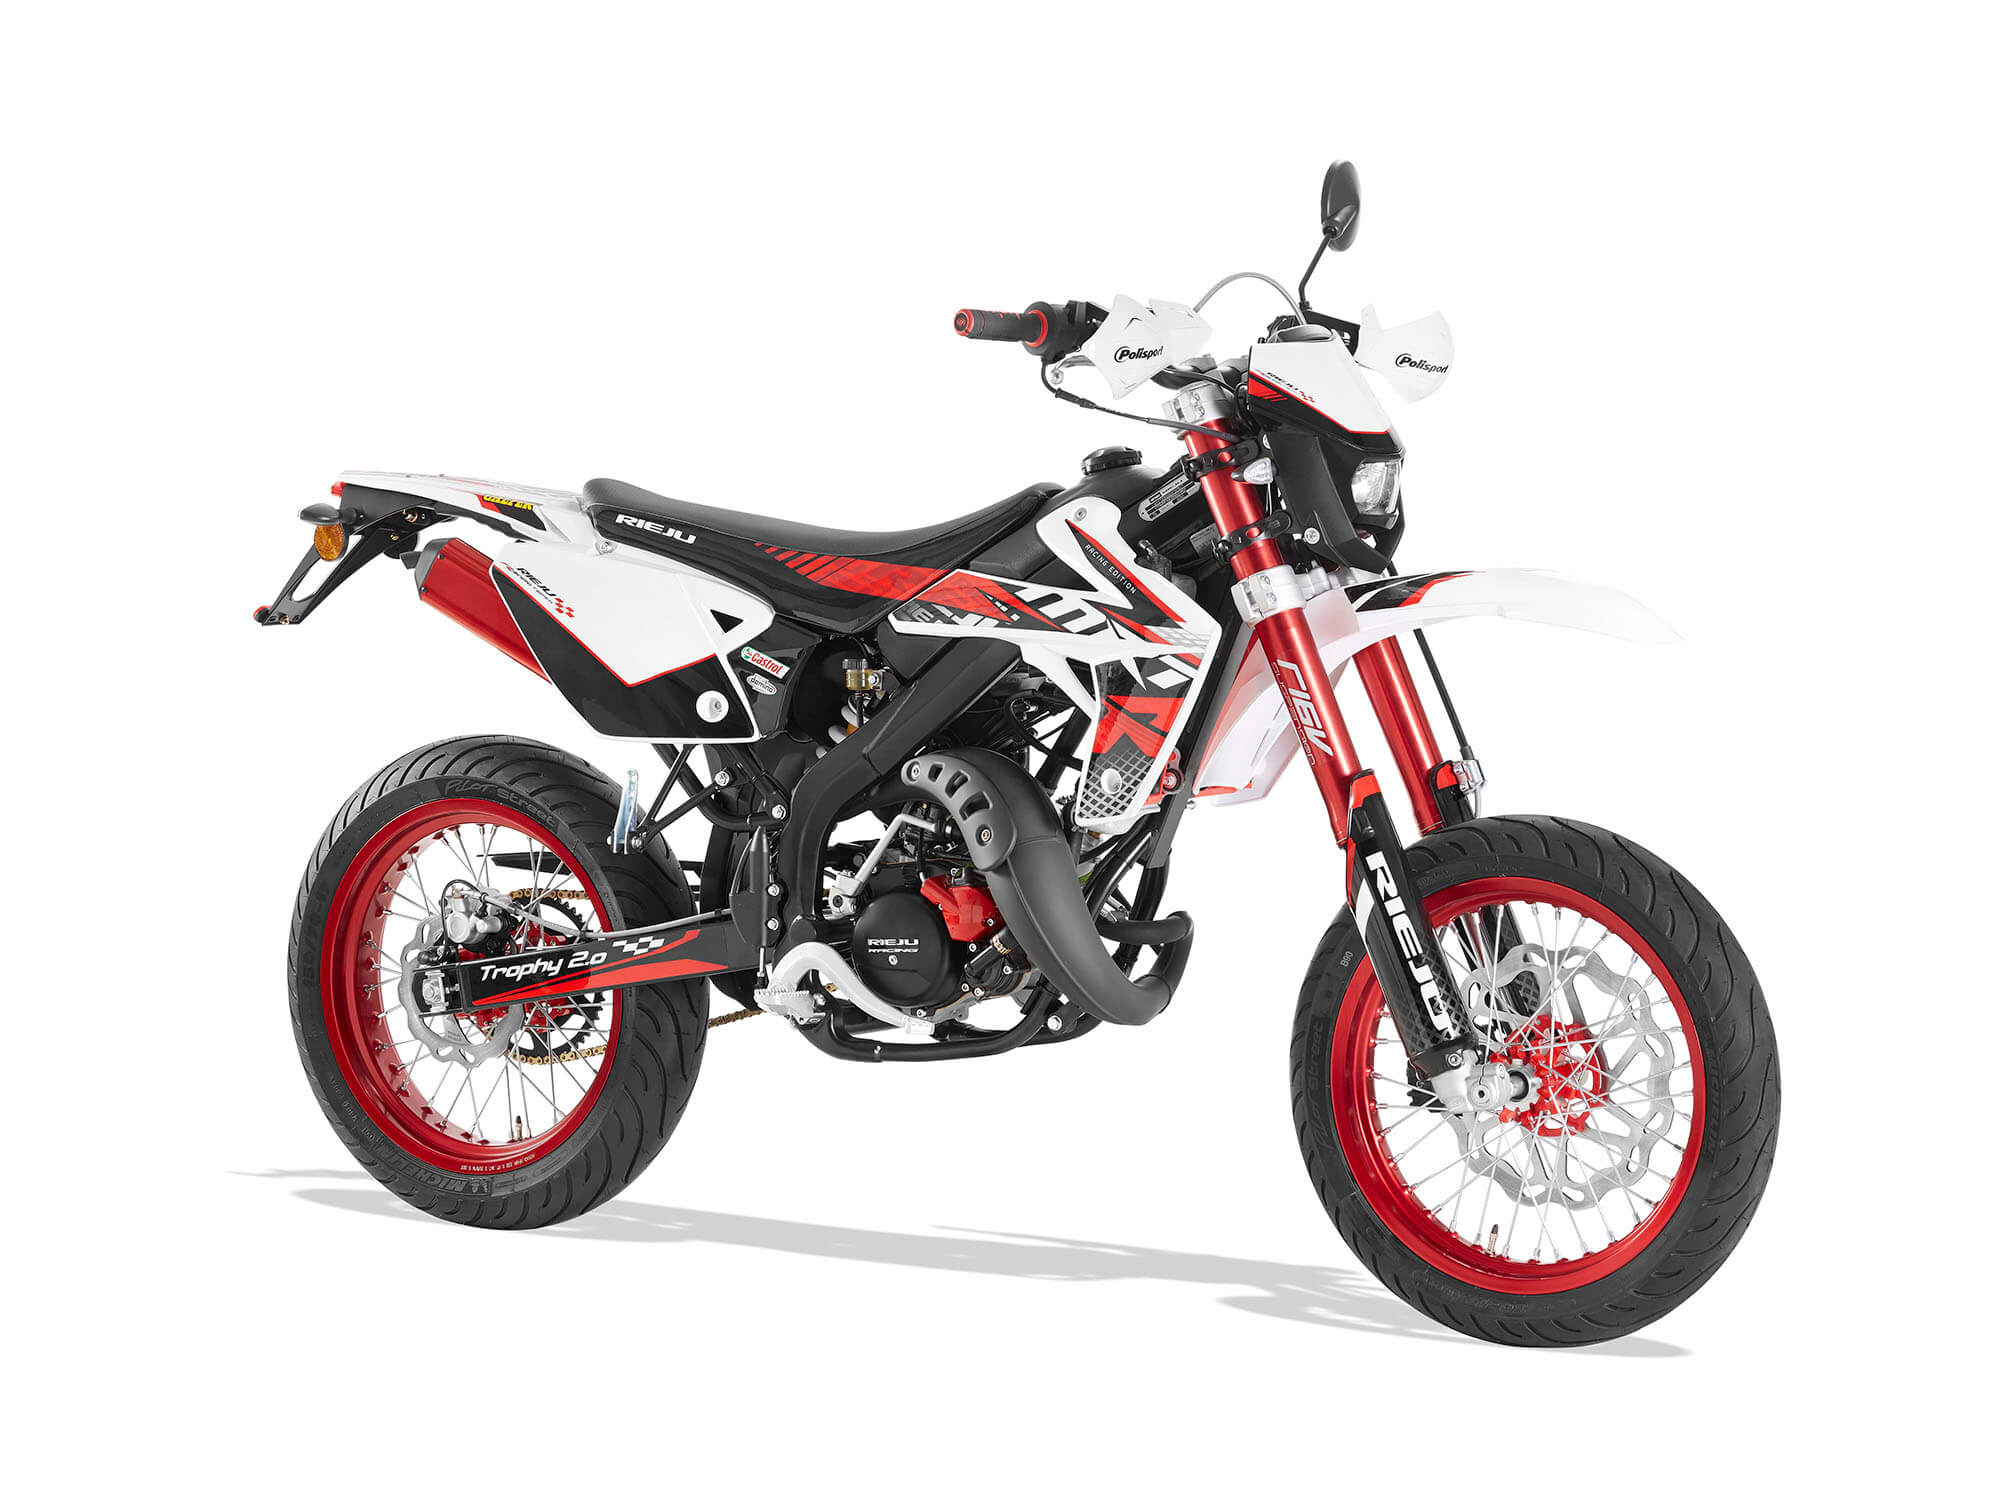 comprar-motos-rieju-mrt-trophy-50-blanco-motissimo-barcelona